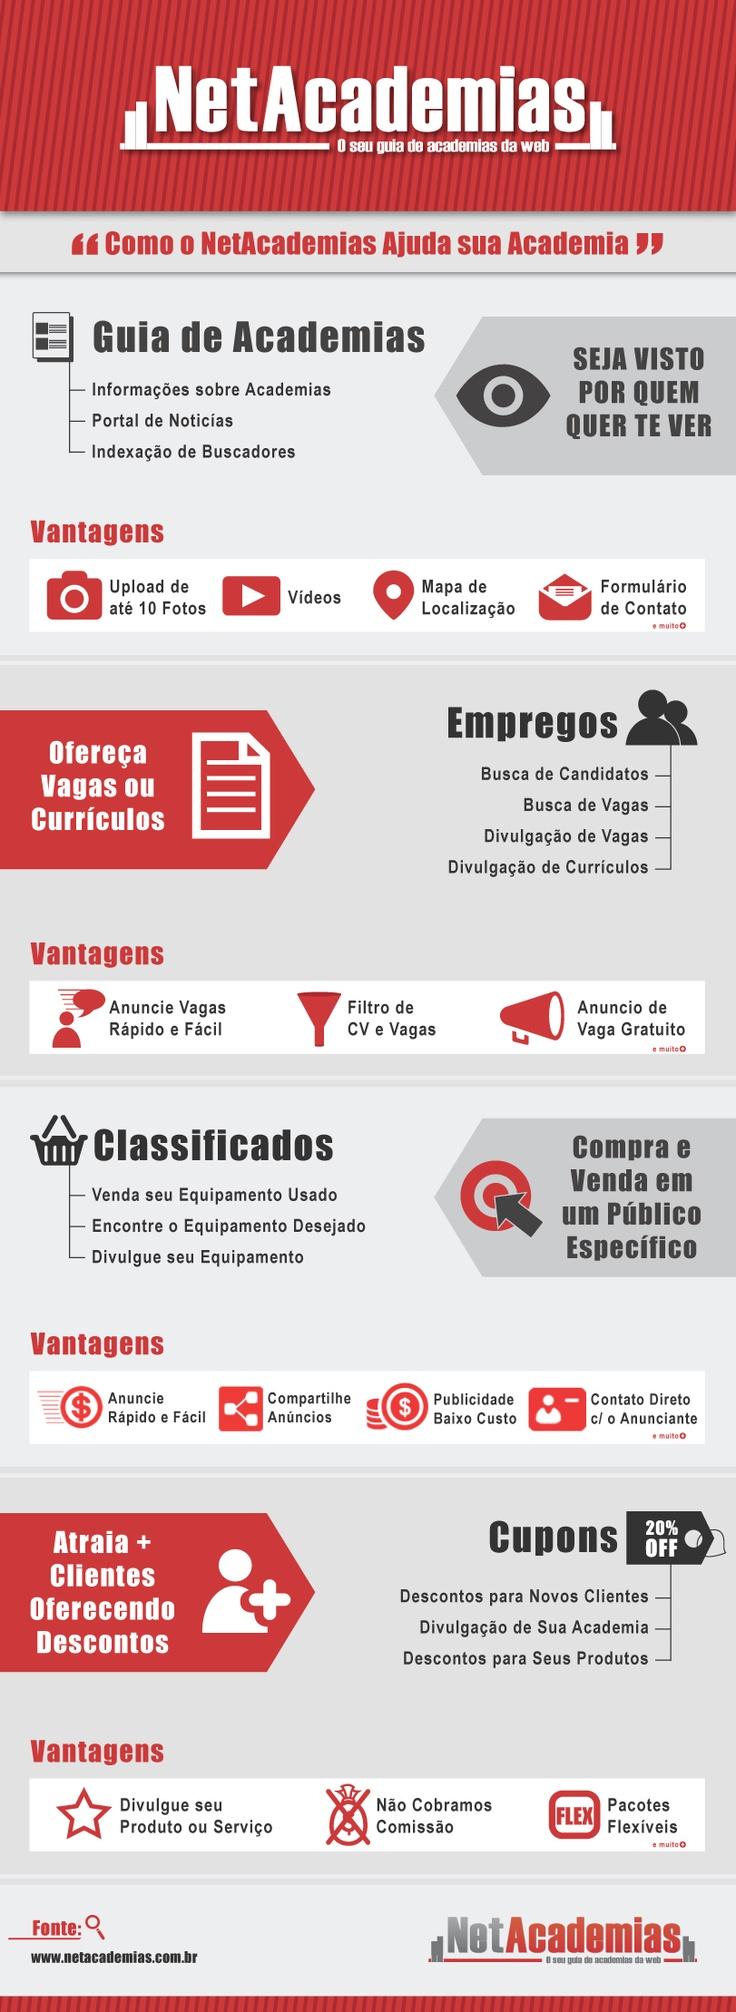 Infográfico - Net Academias  www.netacademias.com.br/